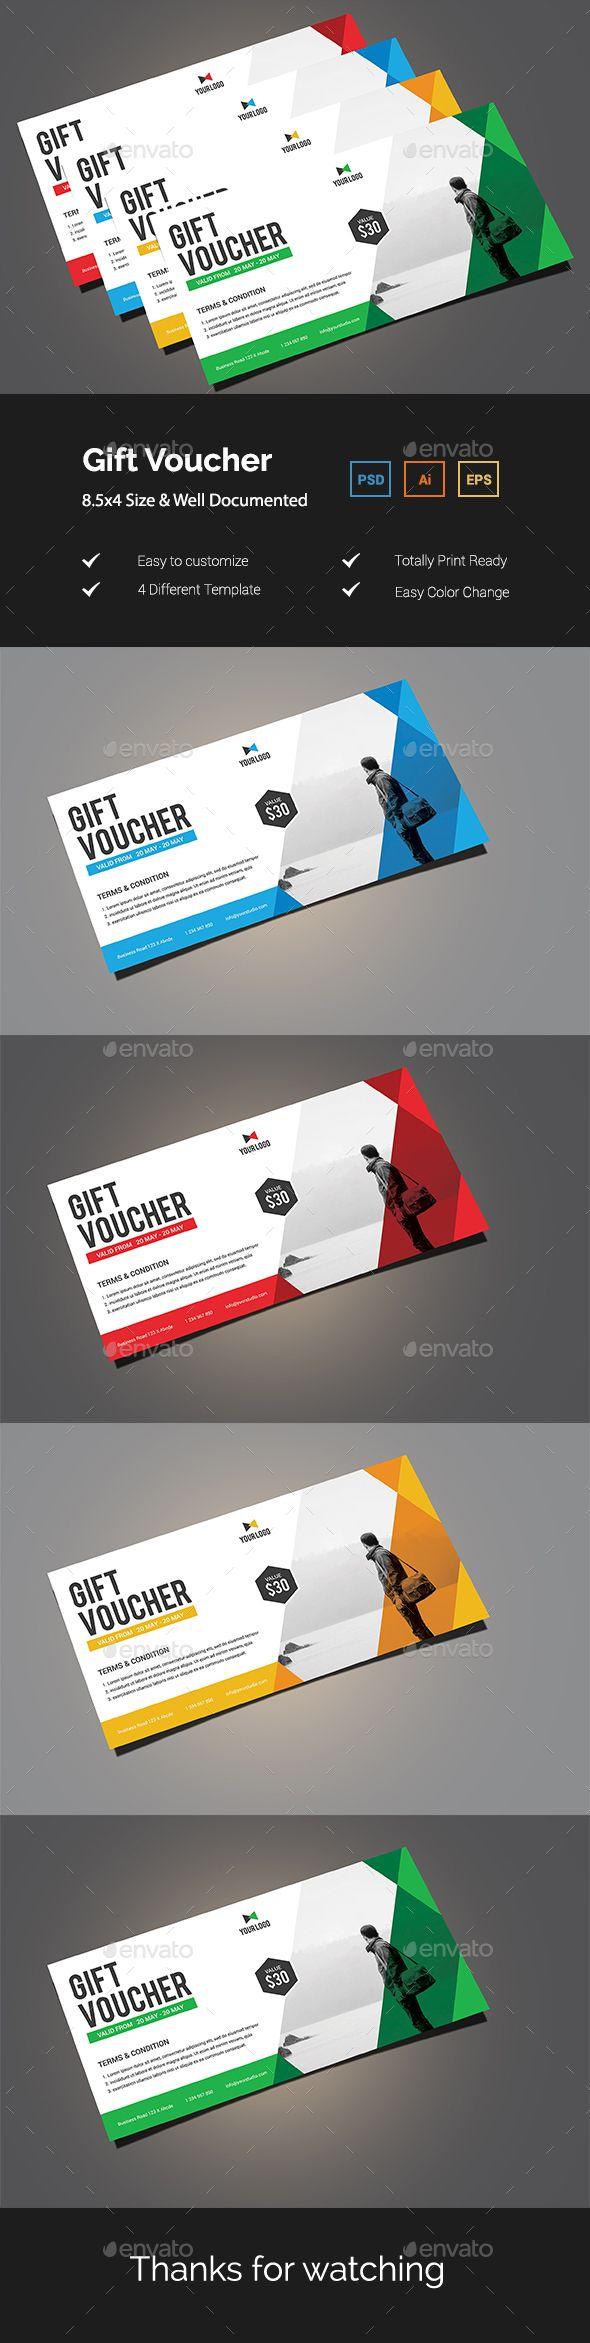 363 best gift voucher templates images on pinterest font logo gift voucher template psd vector eps ai illustrator xflitez Choice Image